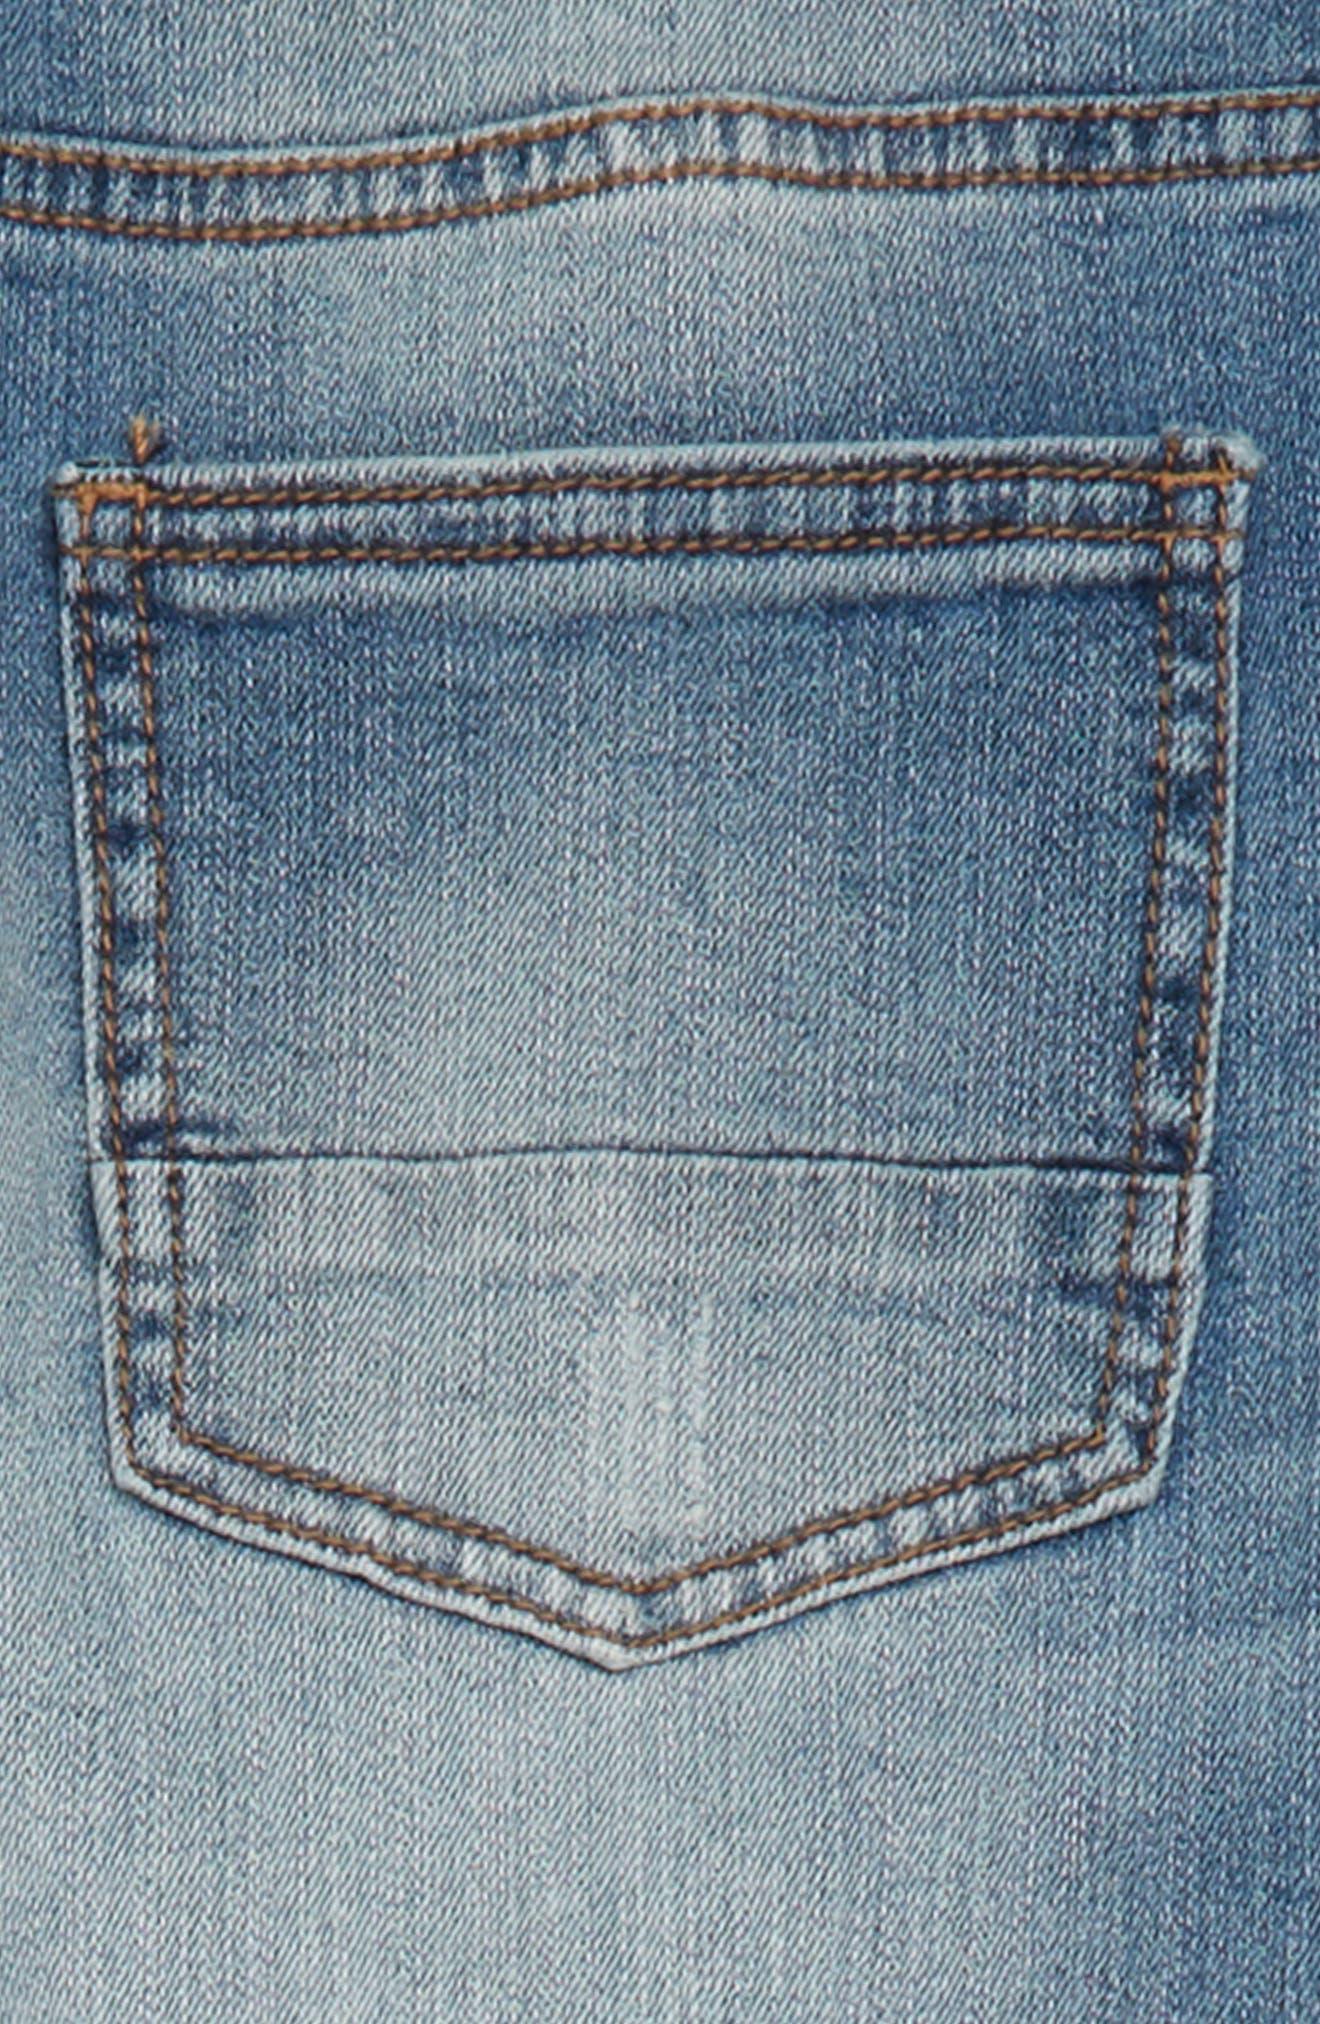 Elwood Pieced Skinny Jeans,                             Alternate thumbnail 3, color,                             424